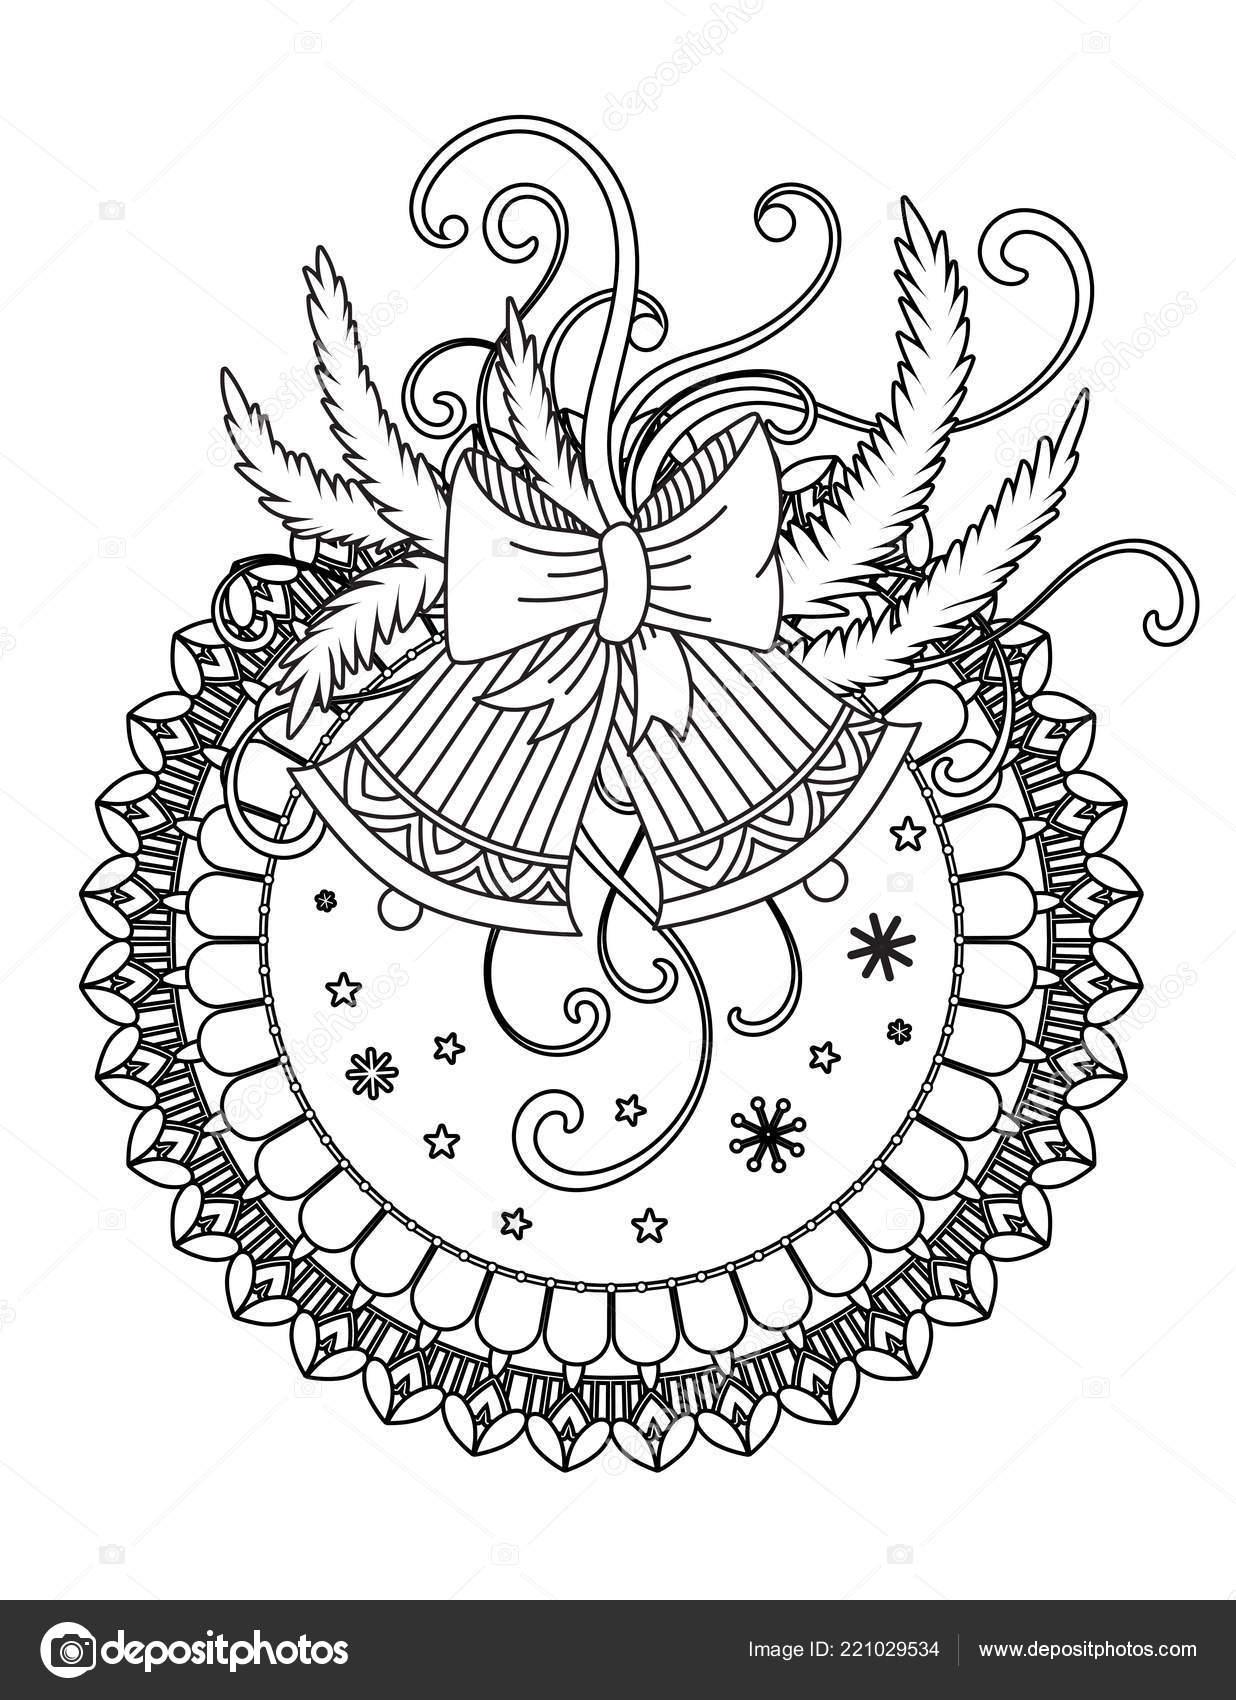 Christmas coloring page — Stock Vector © elinorka #221029534